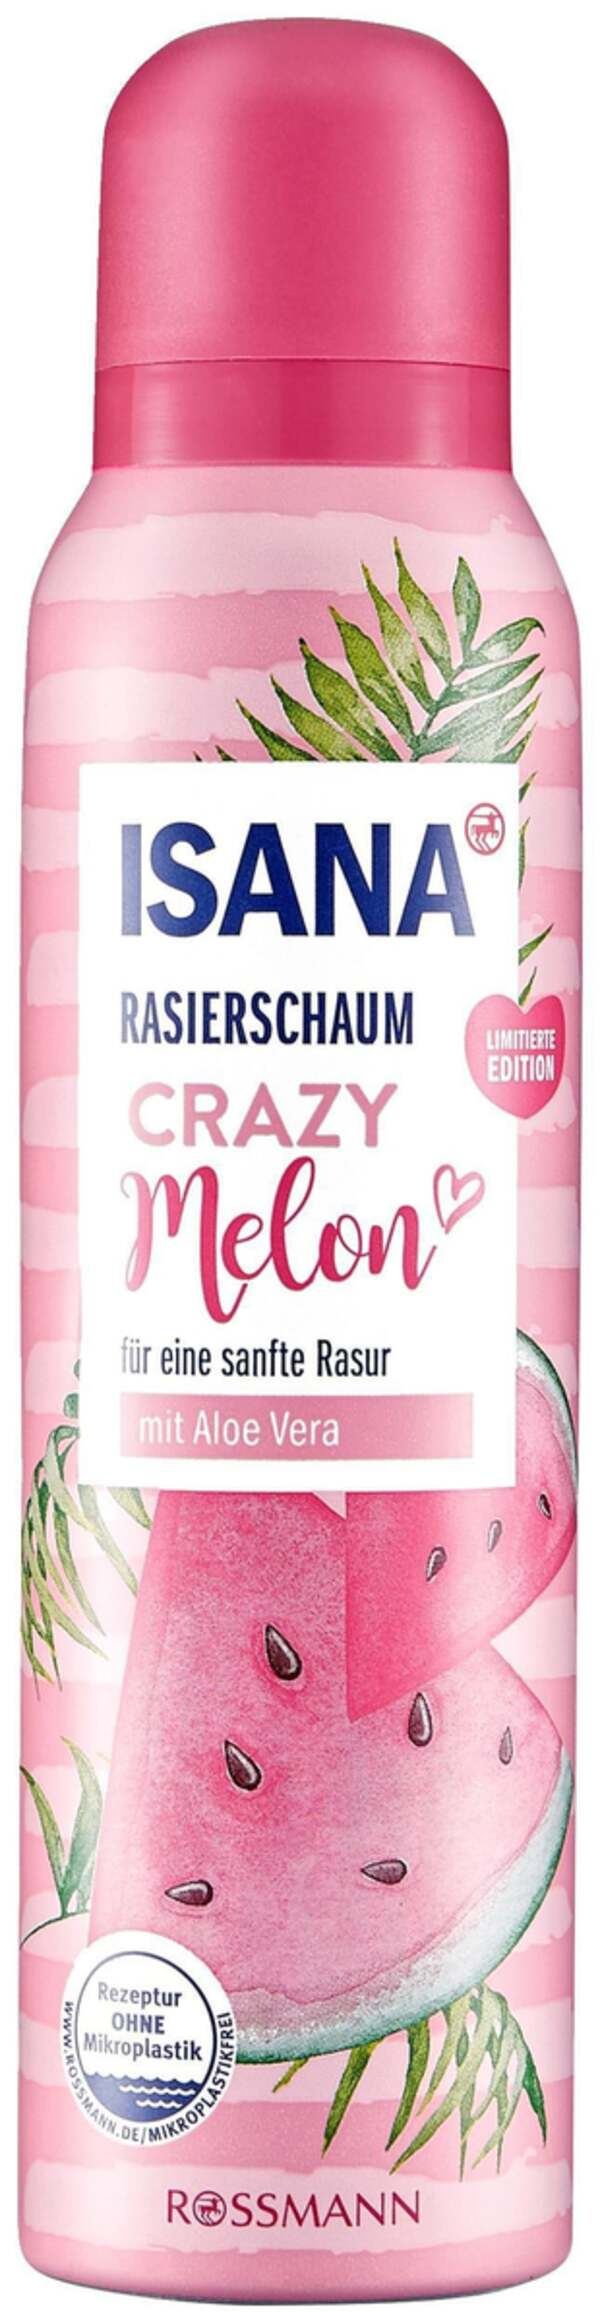 ISANA Rasierschaum Crazy Melon